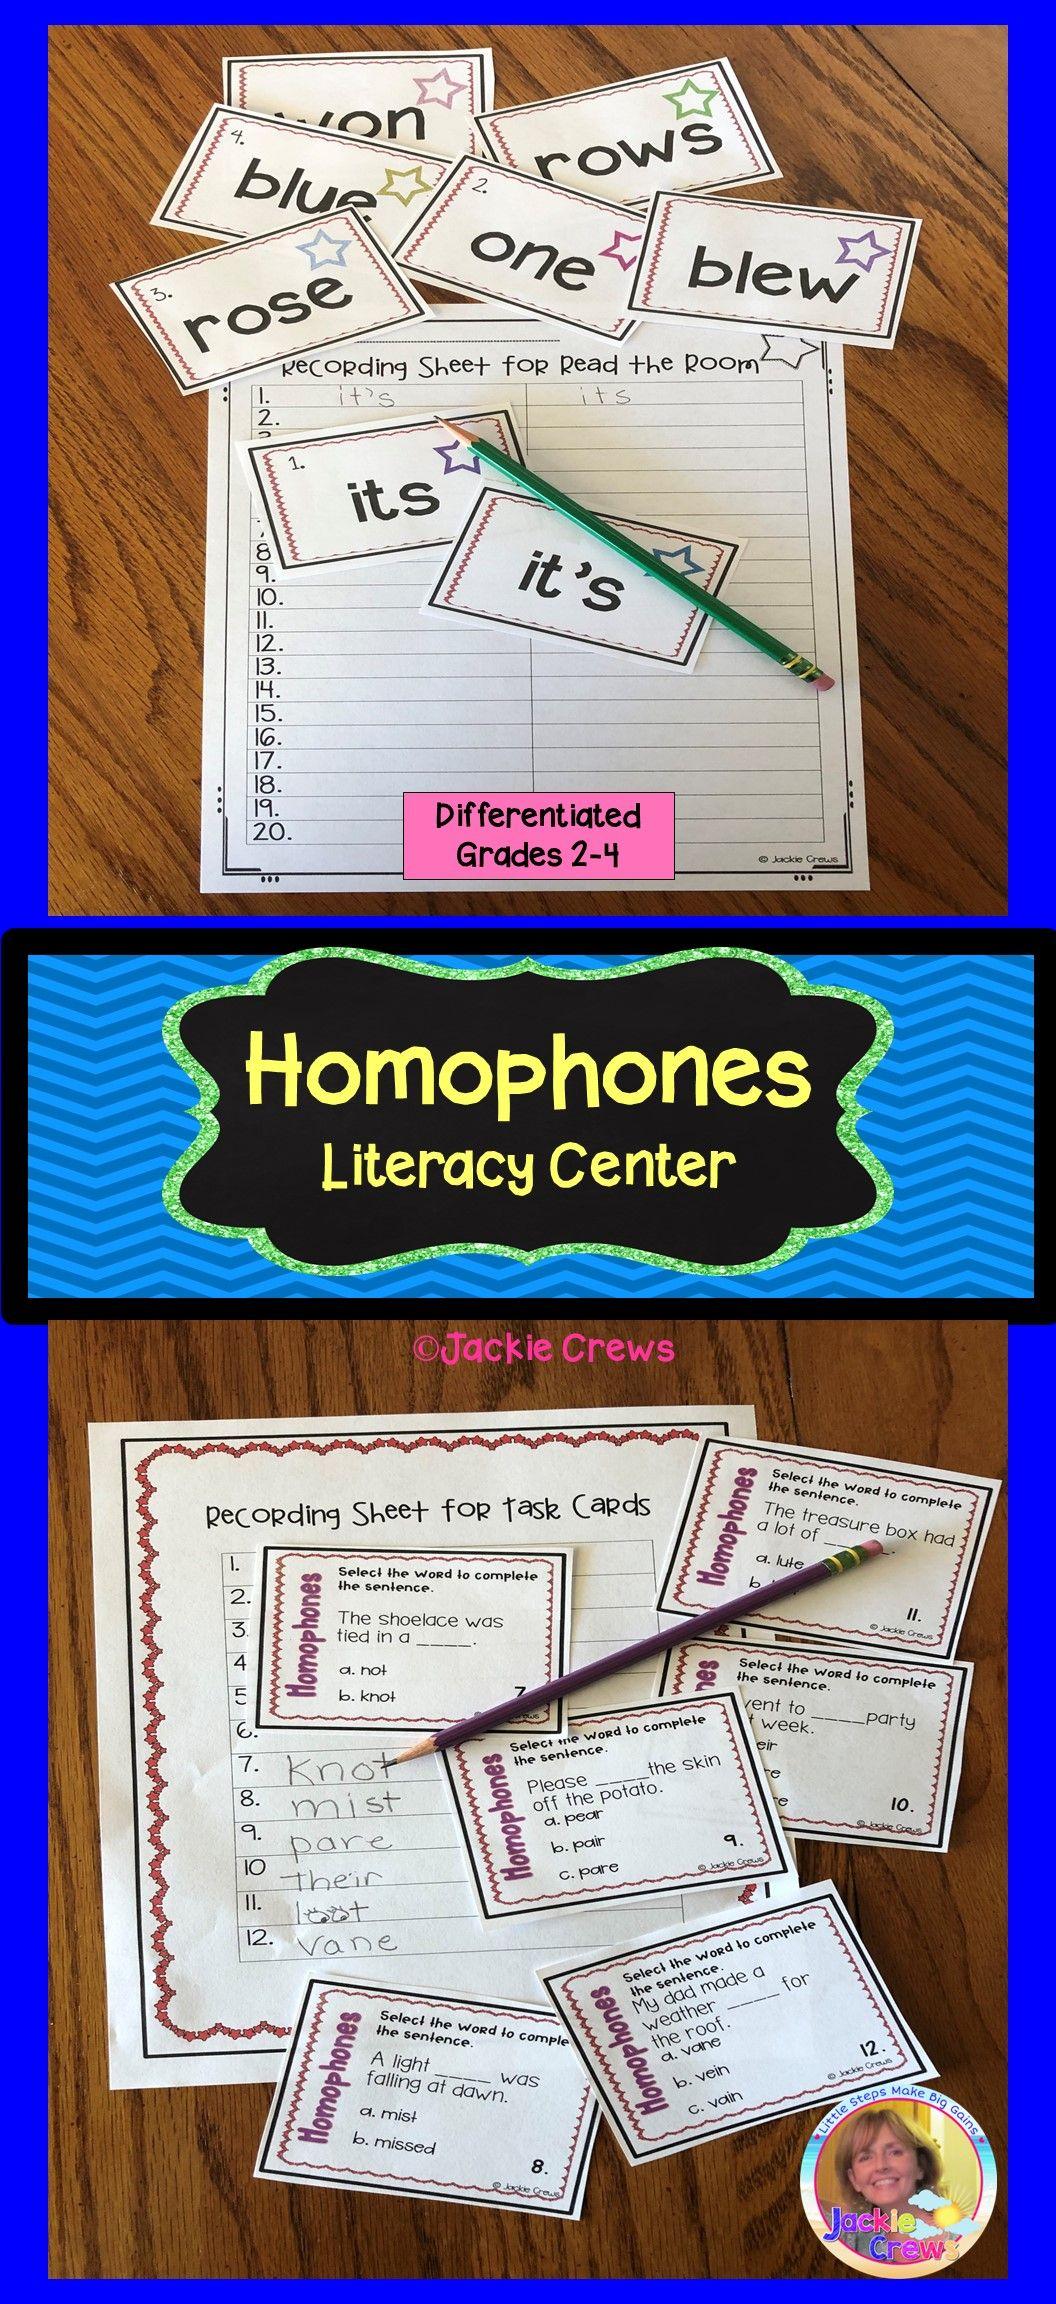 Homophones Literacy Hands On Literacy Center